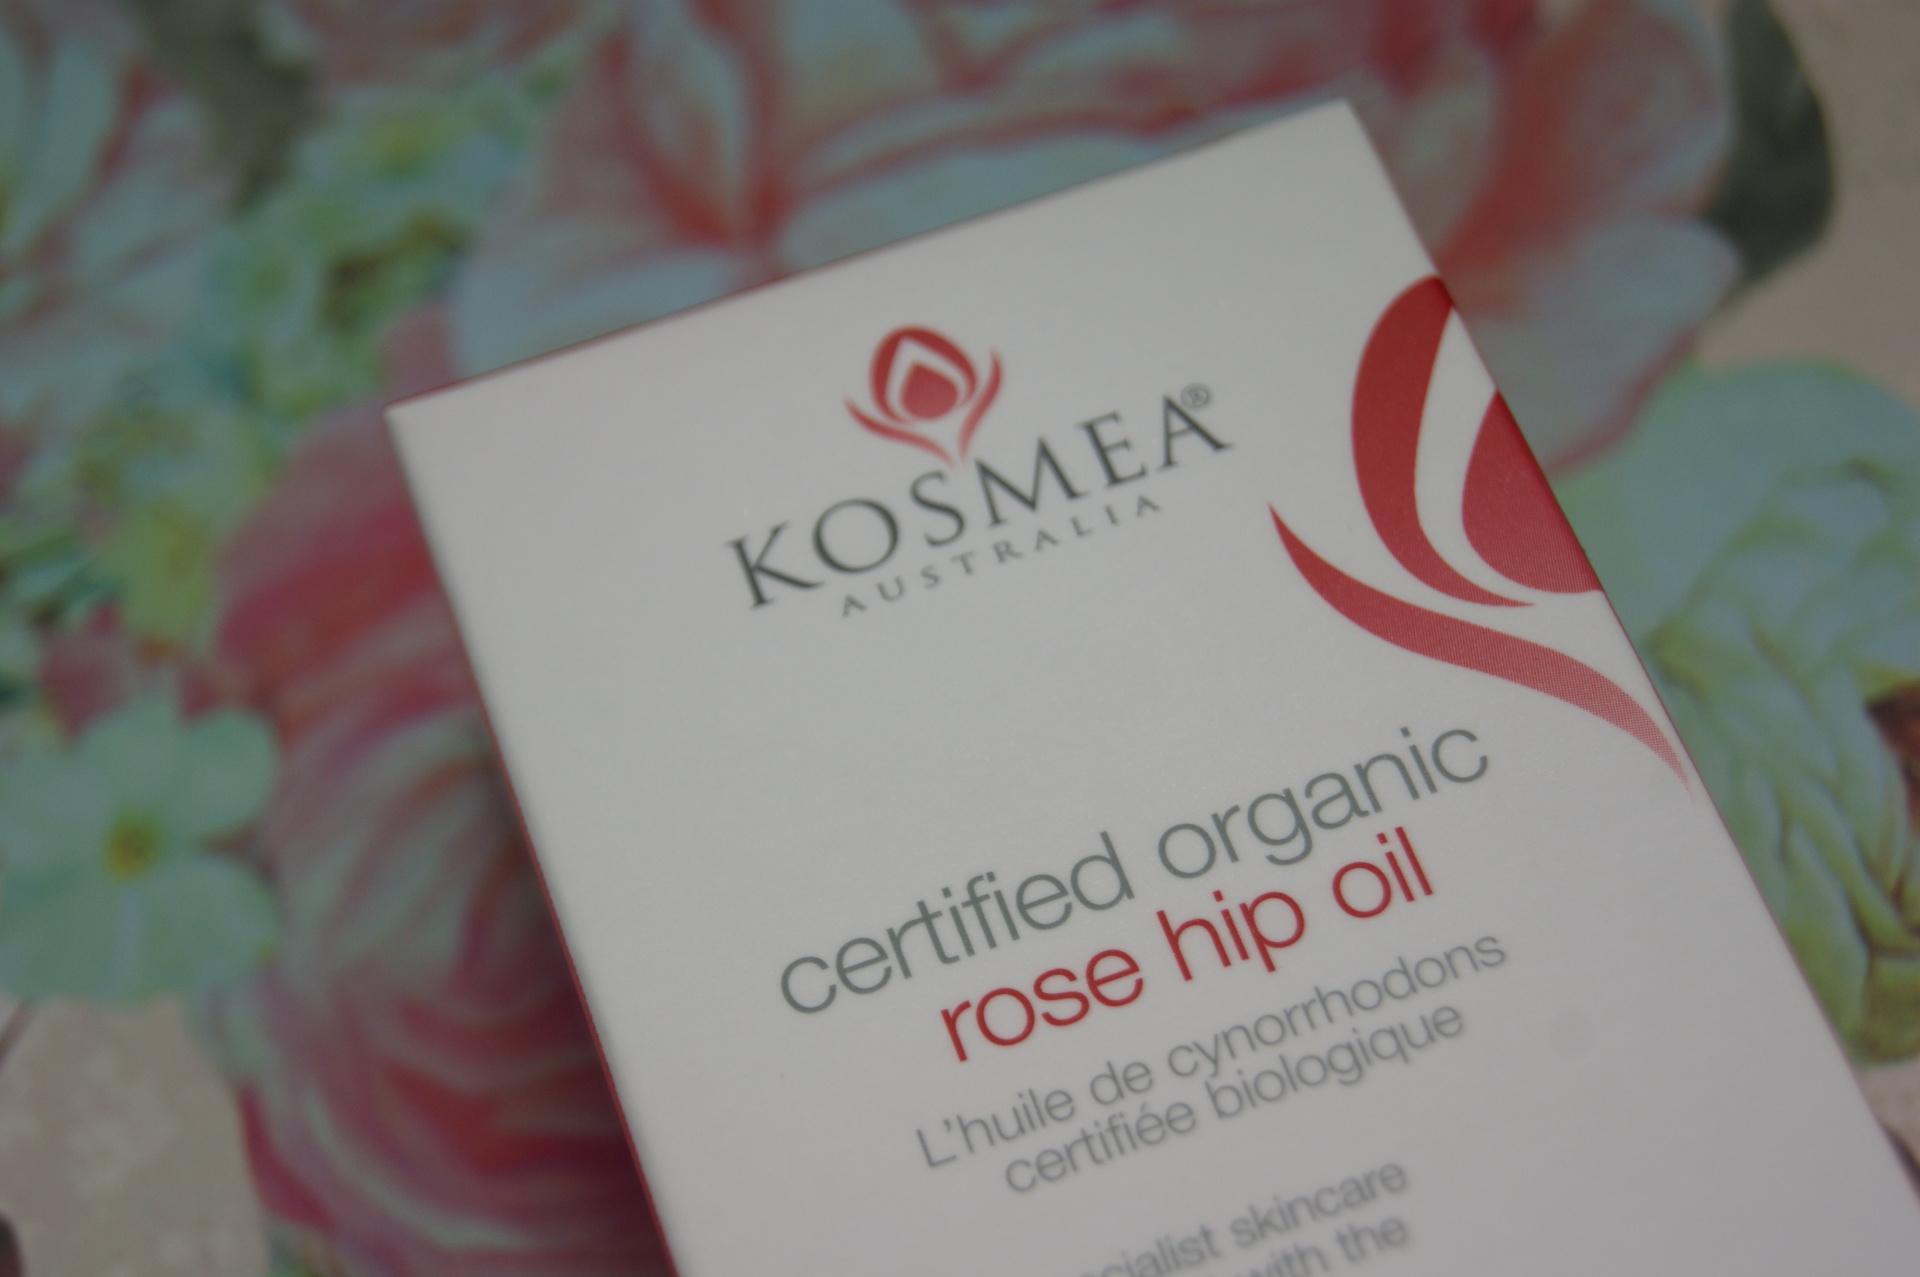 Kosmea - Rose Hip Oil